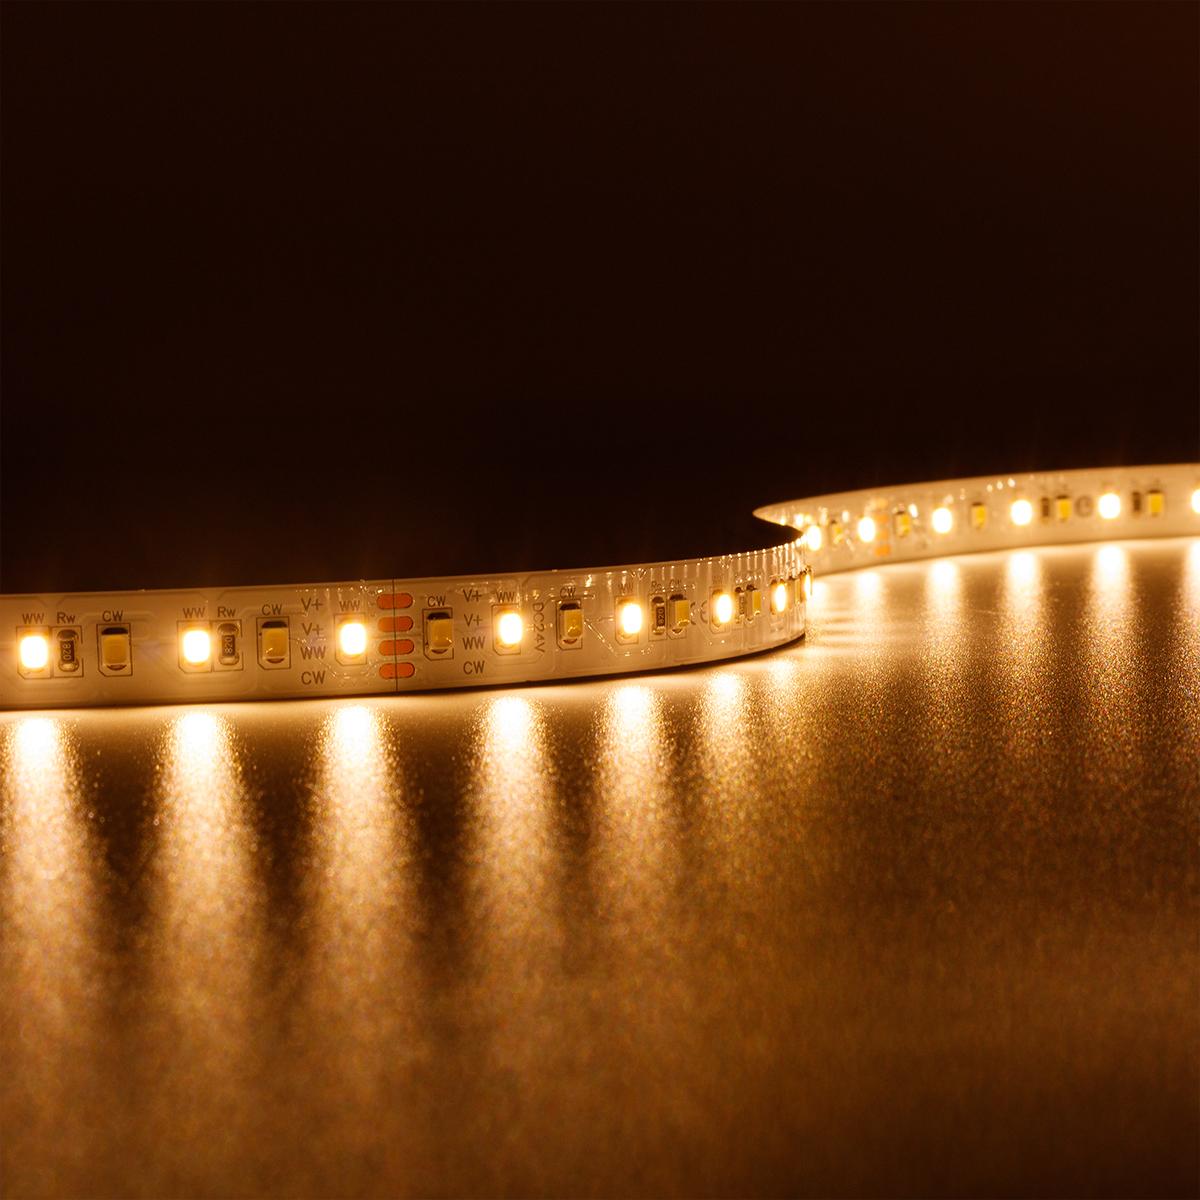 Strip CCT Dual Weiß 24V LED Streifen 5M 18W/m 120LED/m 12mm IP20 Lichtfarbe einstellbar 2700-6000K